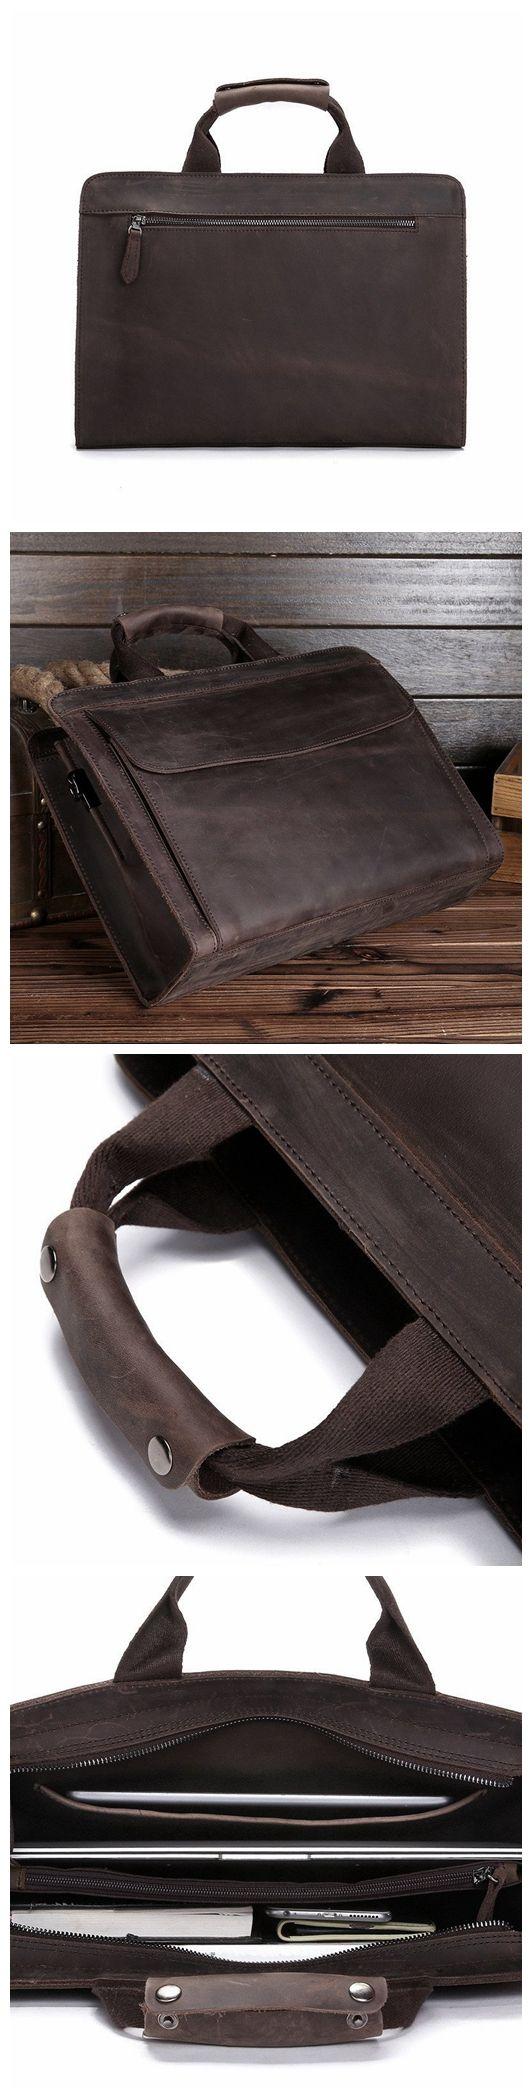 ROCKCOW Genuine Leather Mens Briefcase Laptop Bags Men's Travel Bag Cowhide Men Shoulder Bags Business Man Handbag 80021